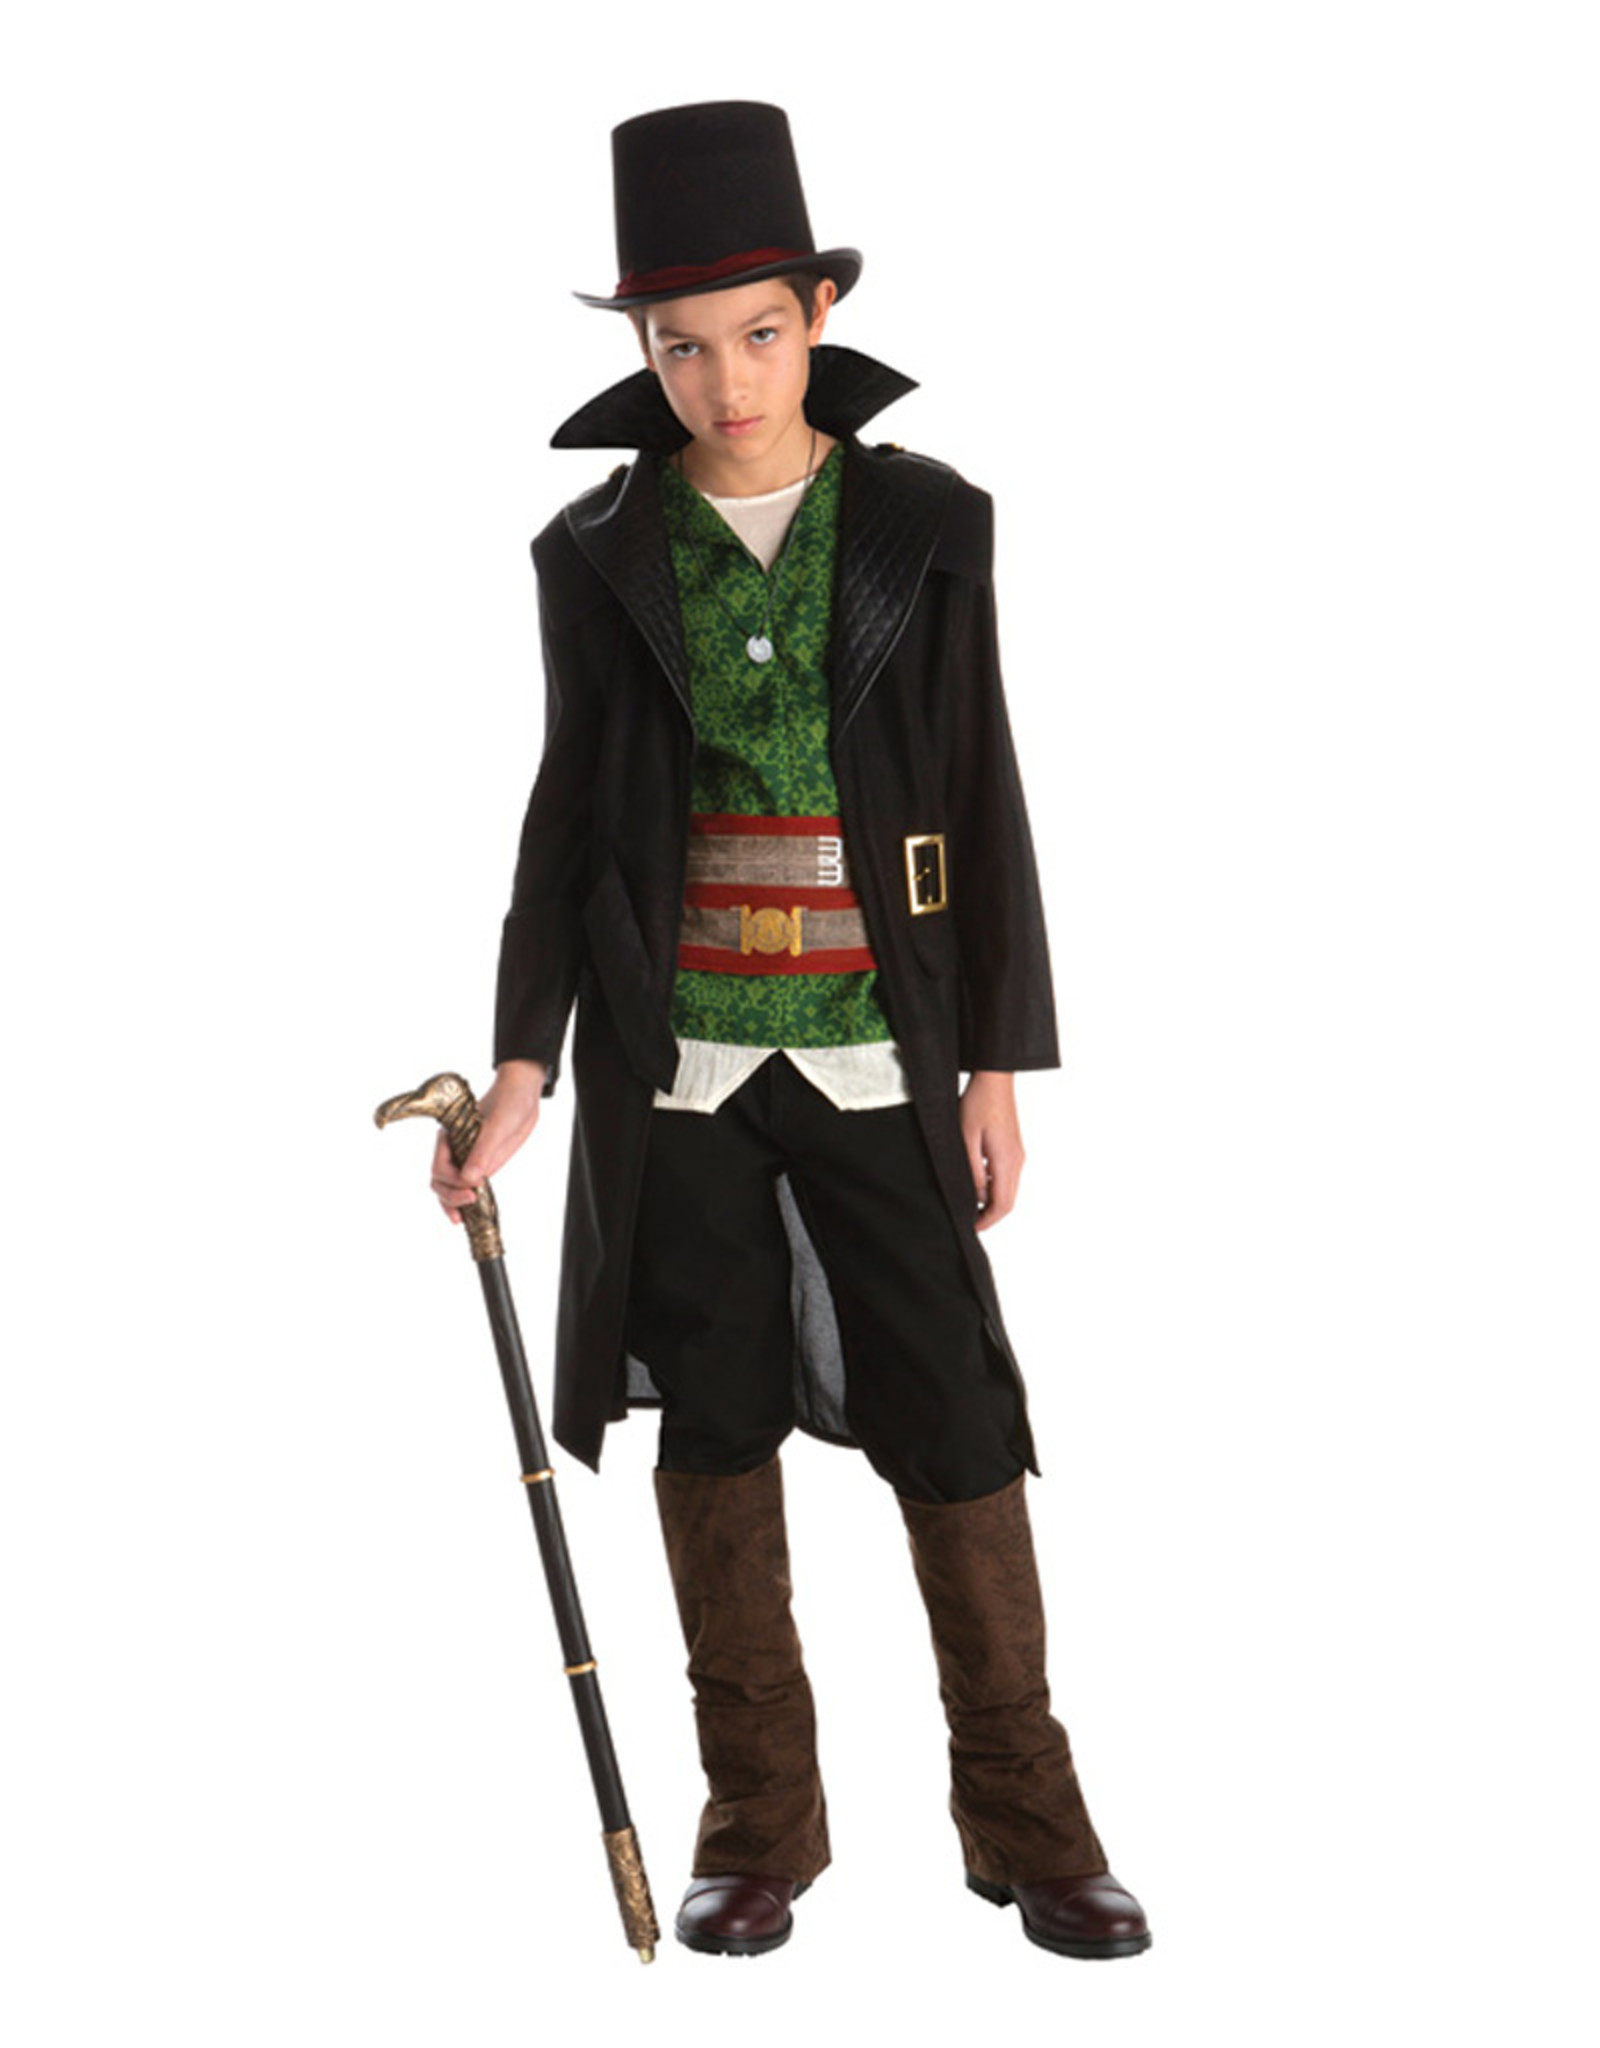 Jacob Frye - Assassin's Creed Costume - Boys